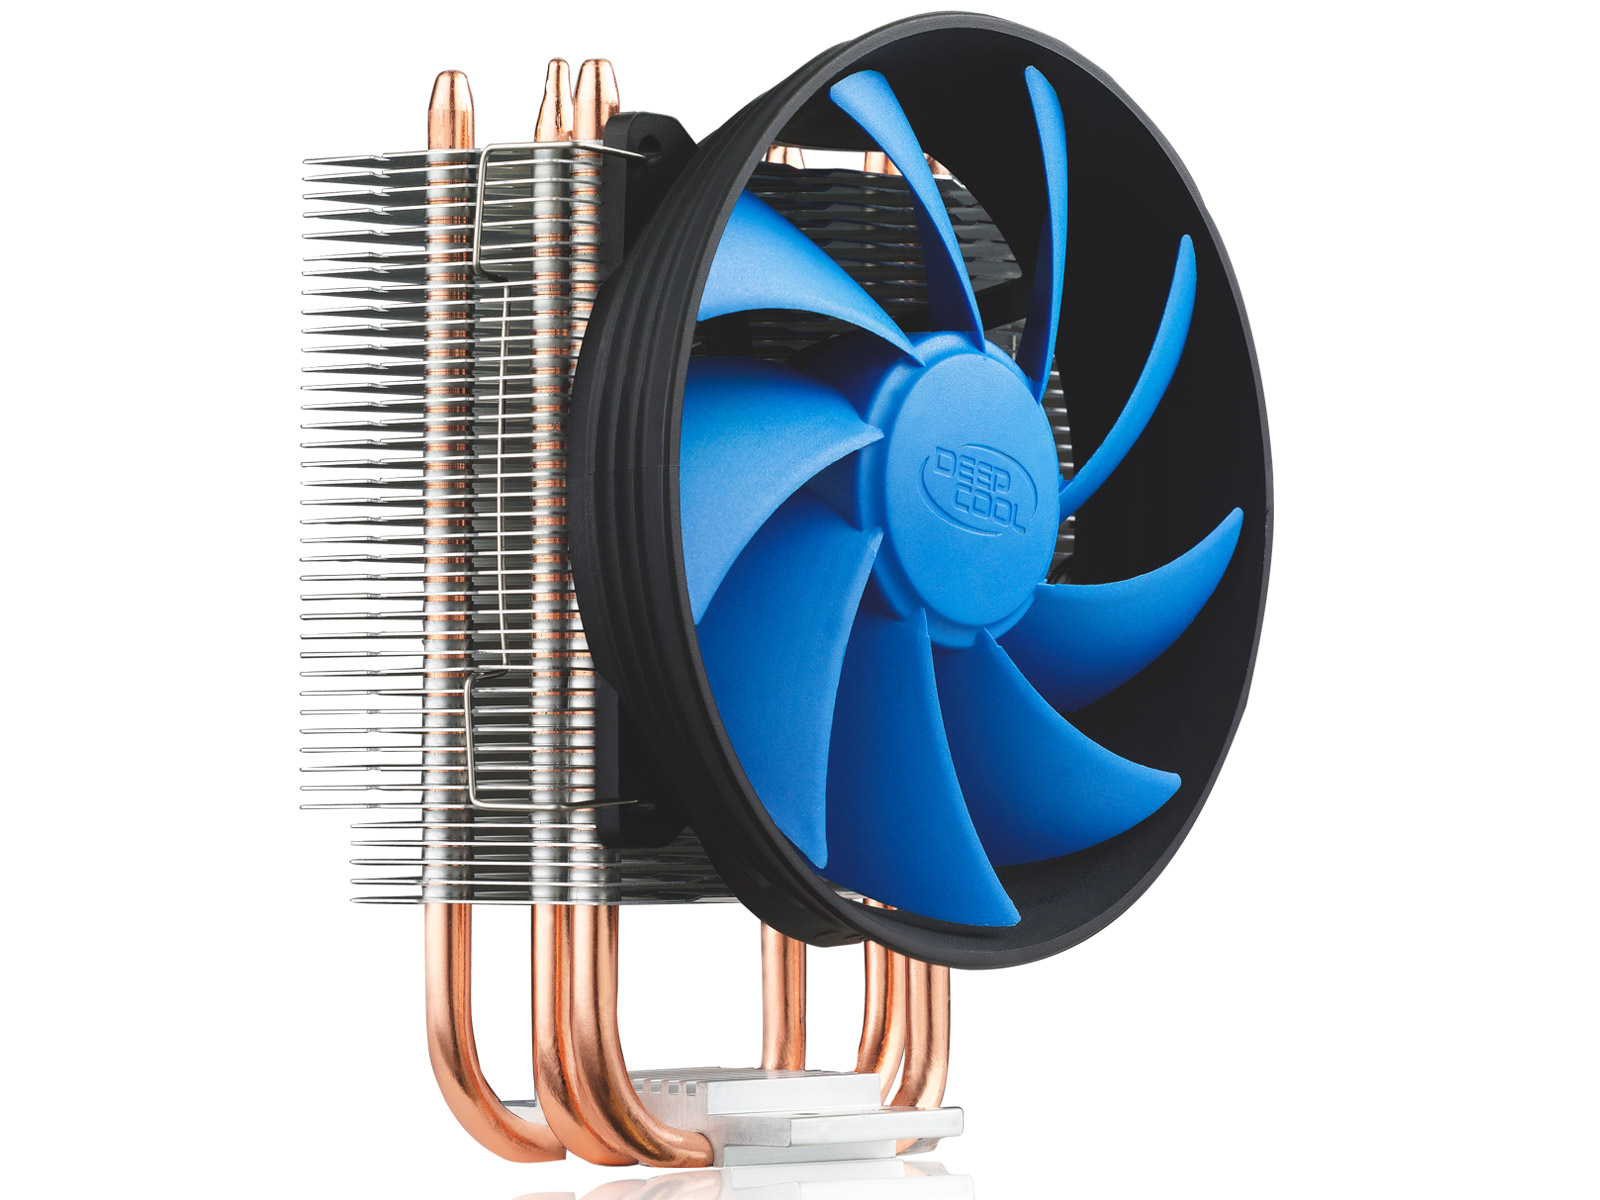 Купить Кулер для процесора Deepcool GAMMAXX 300 (GAMMAXX 300)